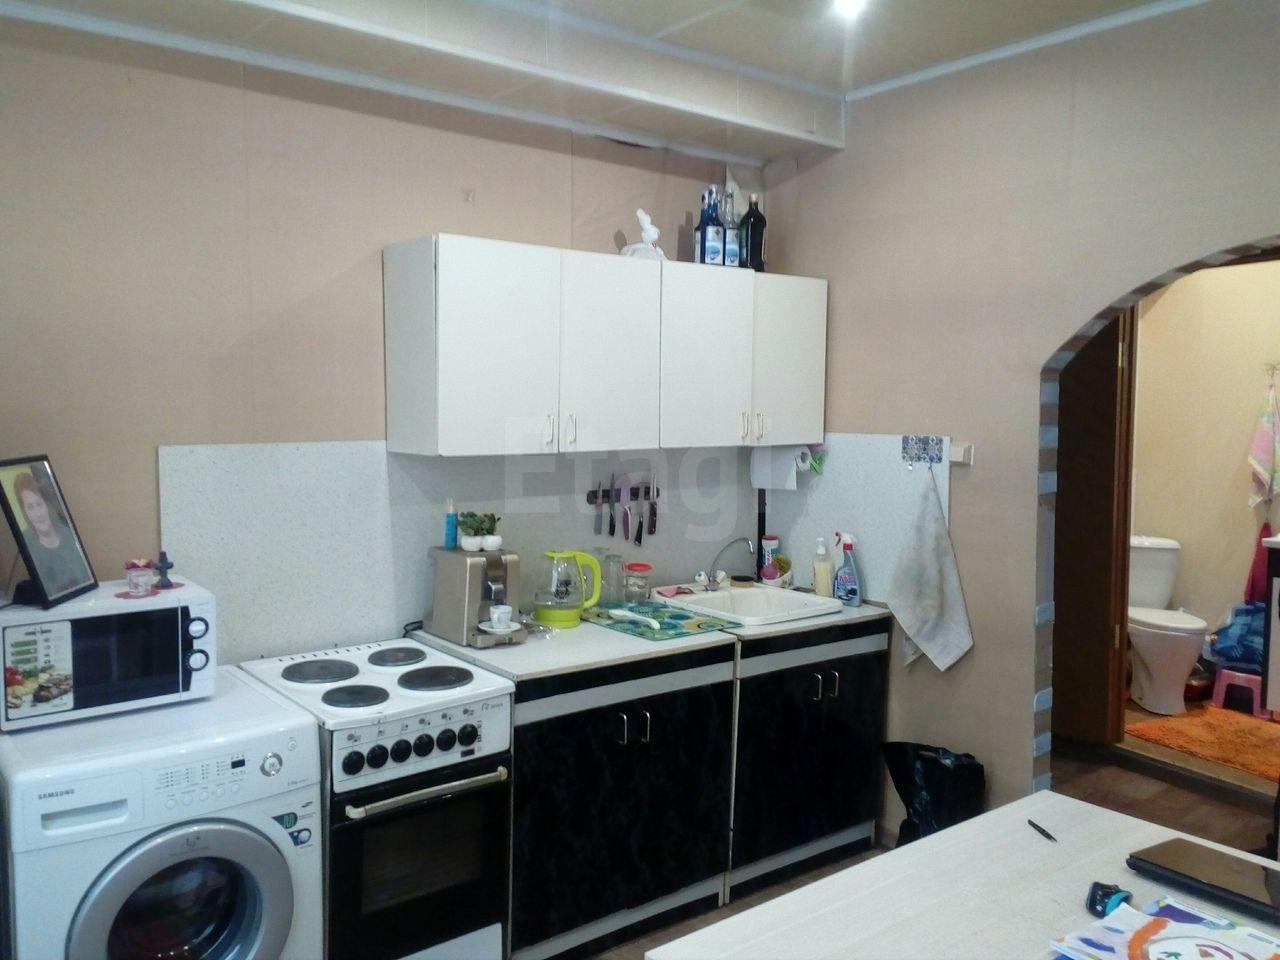 Продается двухкомнатная квартира за 1 150 000 рублей. Вагонка, ул. Правды, д. 19 (8.2 км до центра).